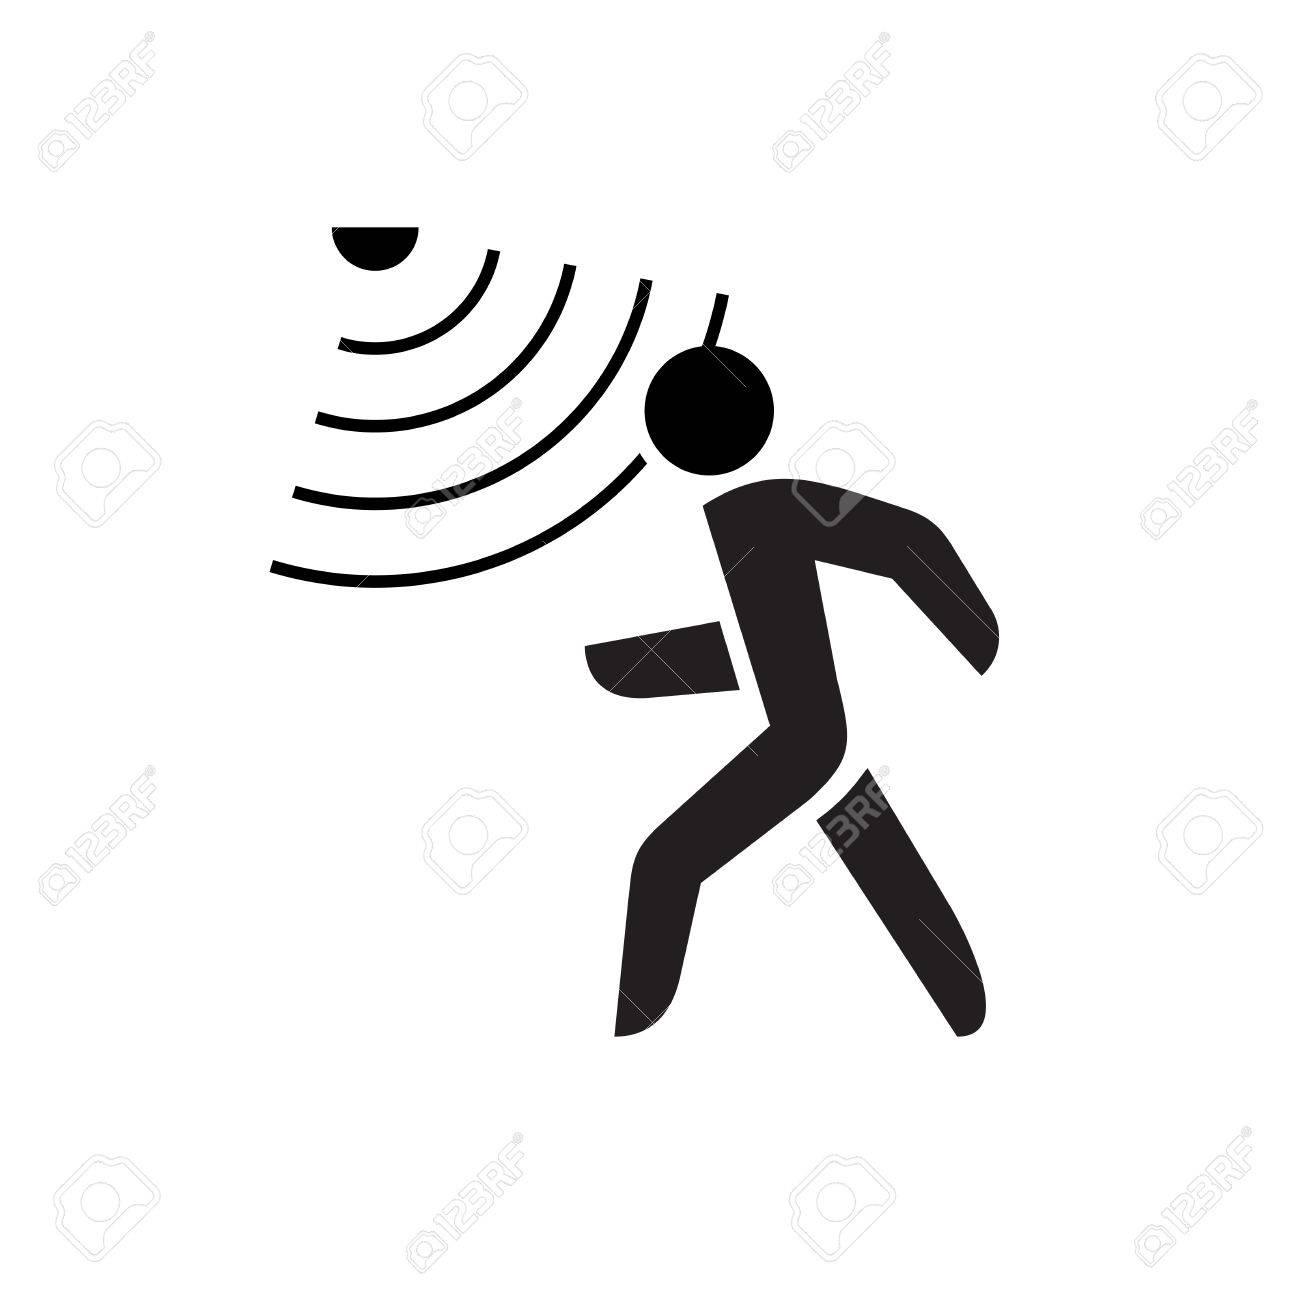 Walking man symbol with motion sensor waves signal. - 54919344